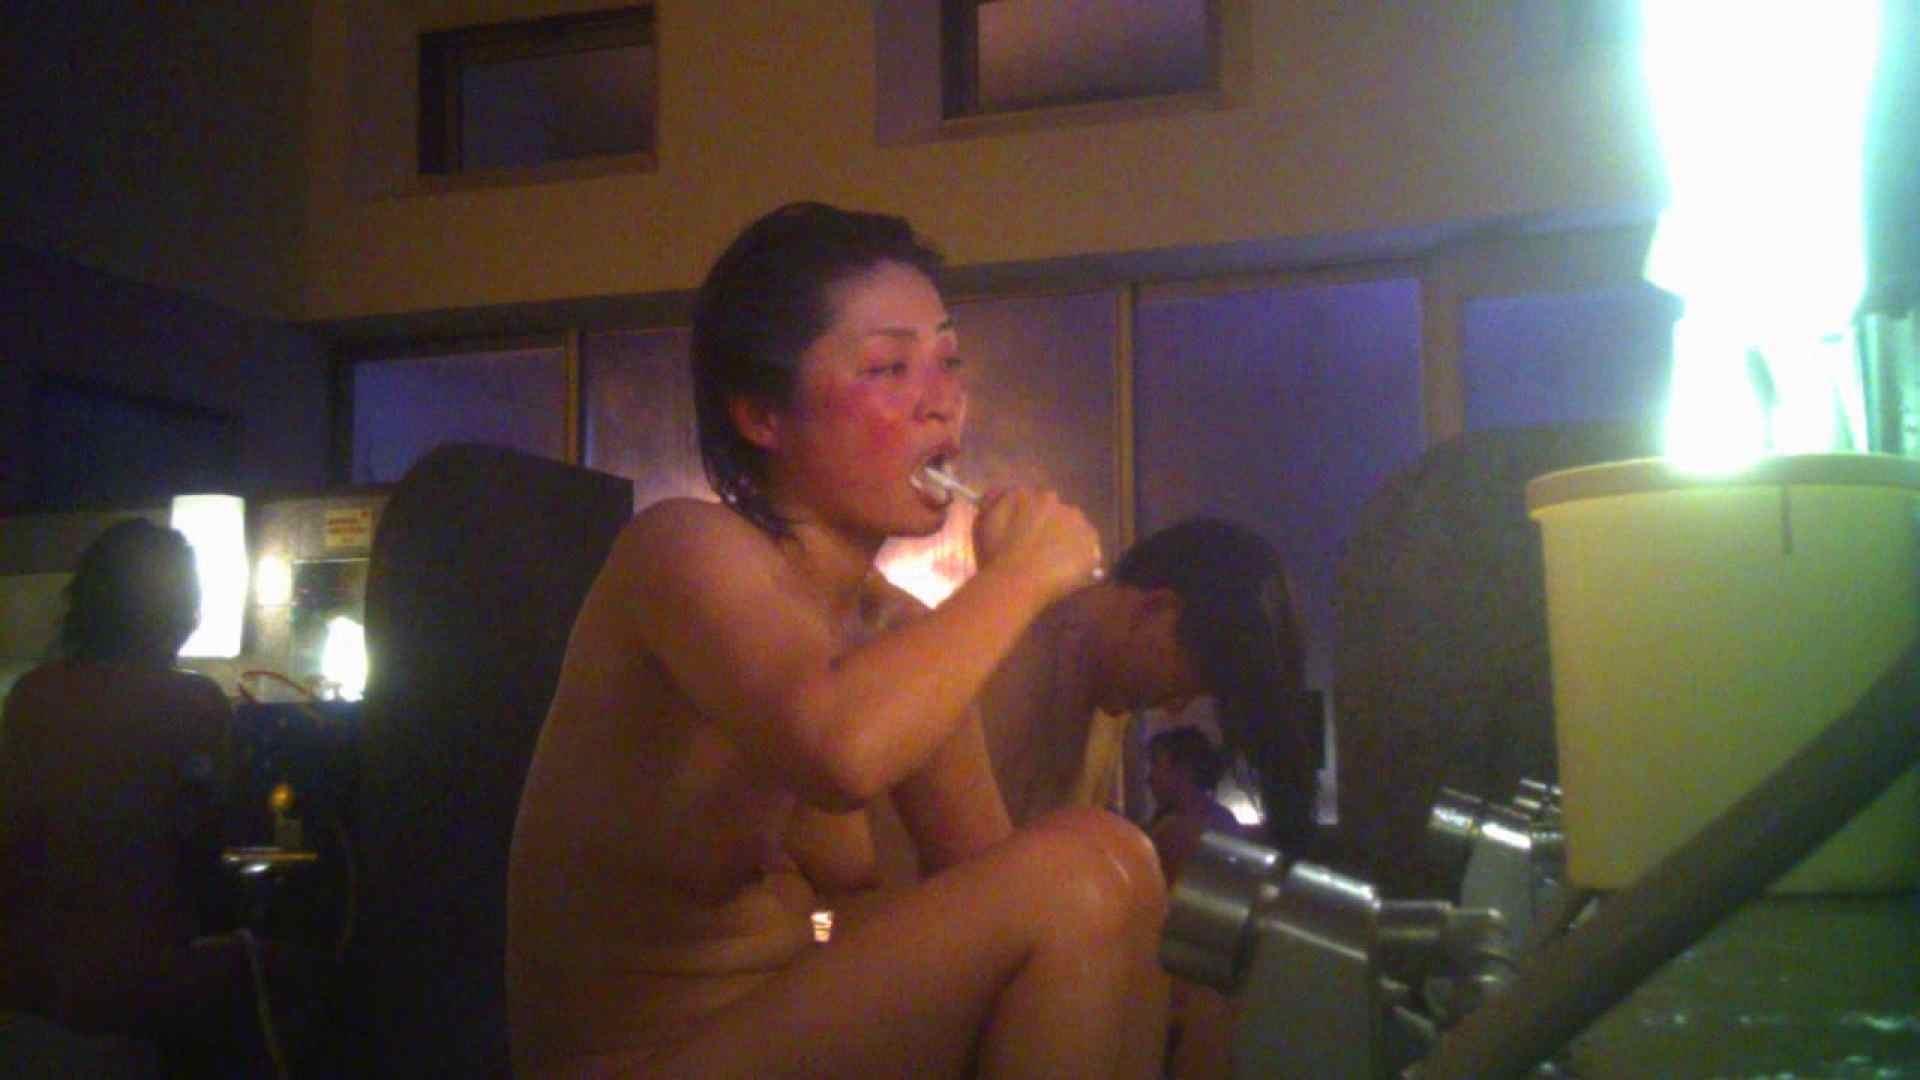 TG.21 【上等兵】井戸端会議が大好きな奥さん 女風呂 | 女湯  69画像 6